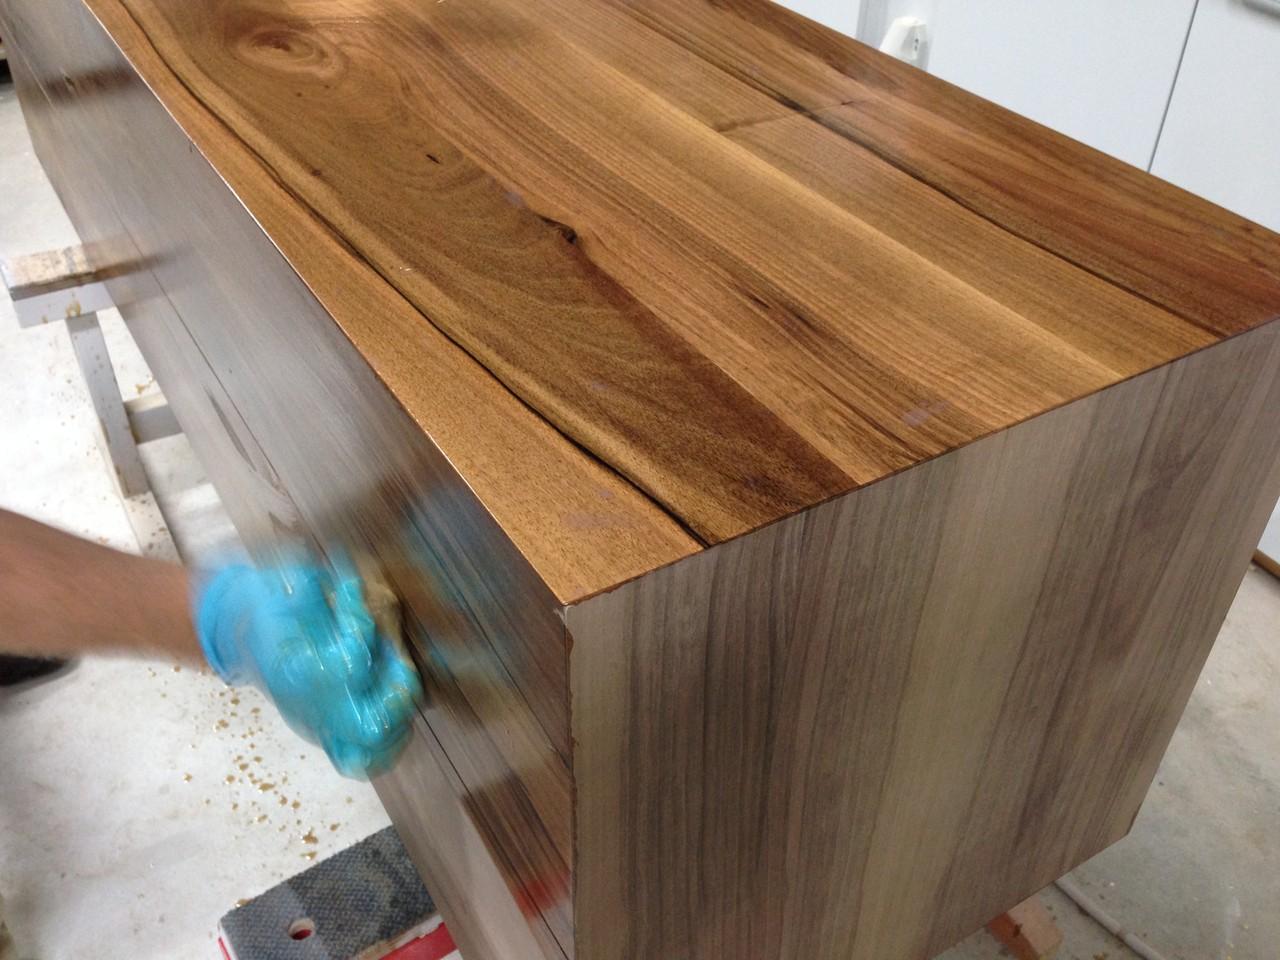 Holz Ölen - Schreinerei Winterthur - Raphael Meier Holzwerke